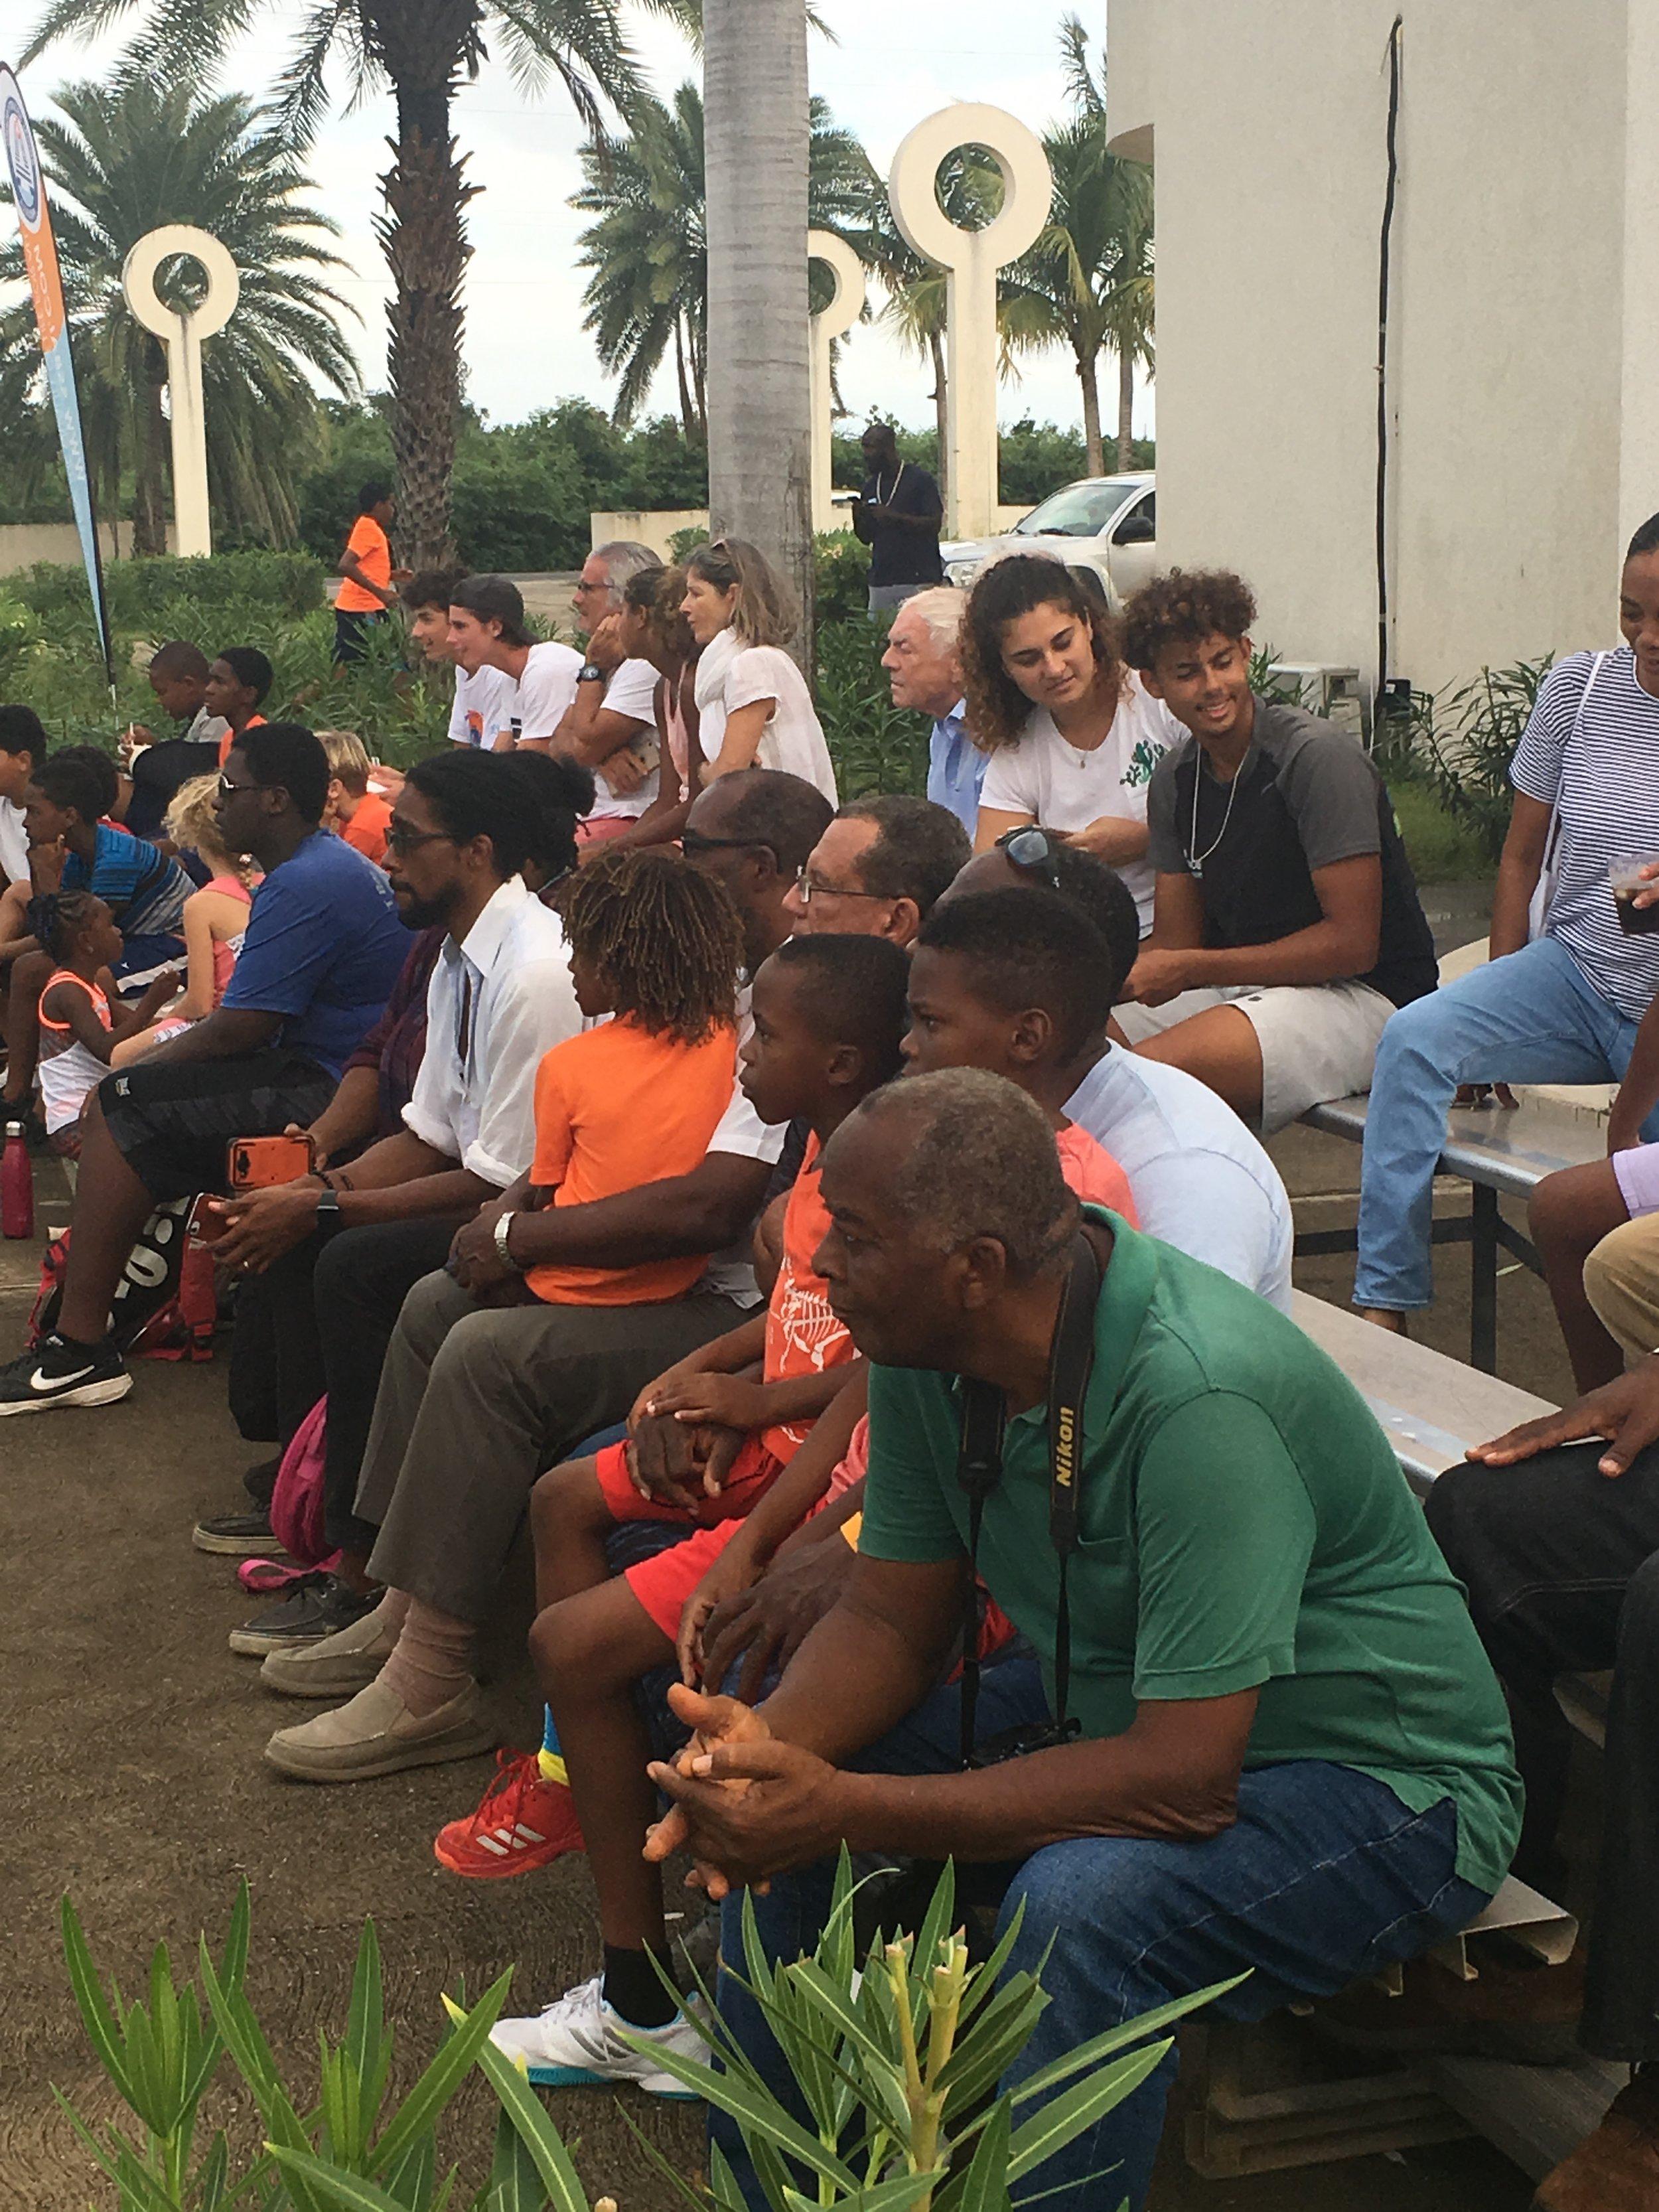 Spectators at Anguilla Cup  Pro Exhibition Match